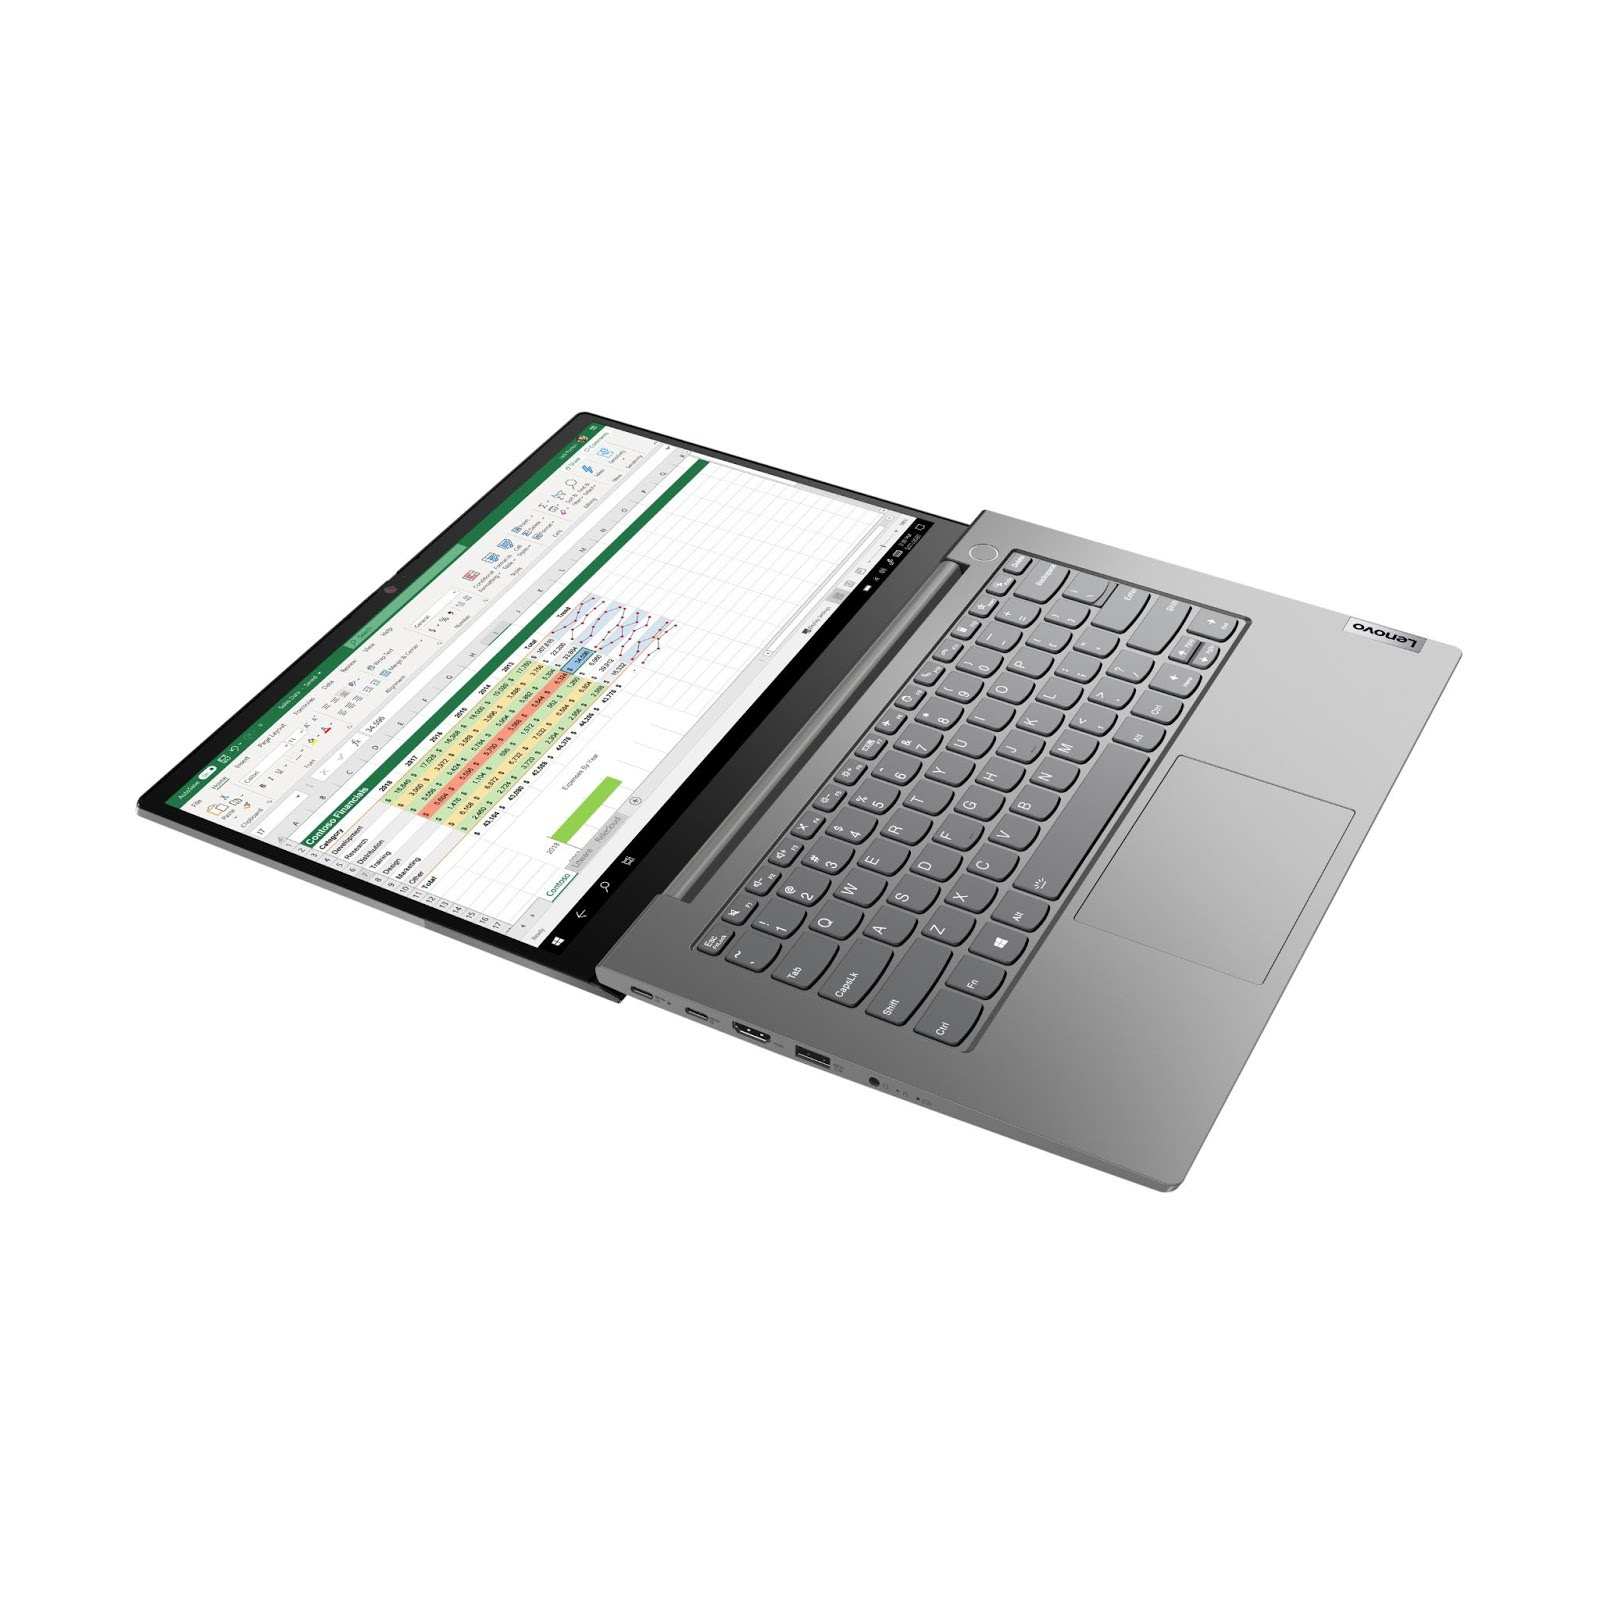 Фото 3. Ноутбук Lenovo ThinkBook 14 Gen 2 ITL Mineral Grey (20VD000BRU)